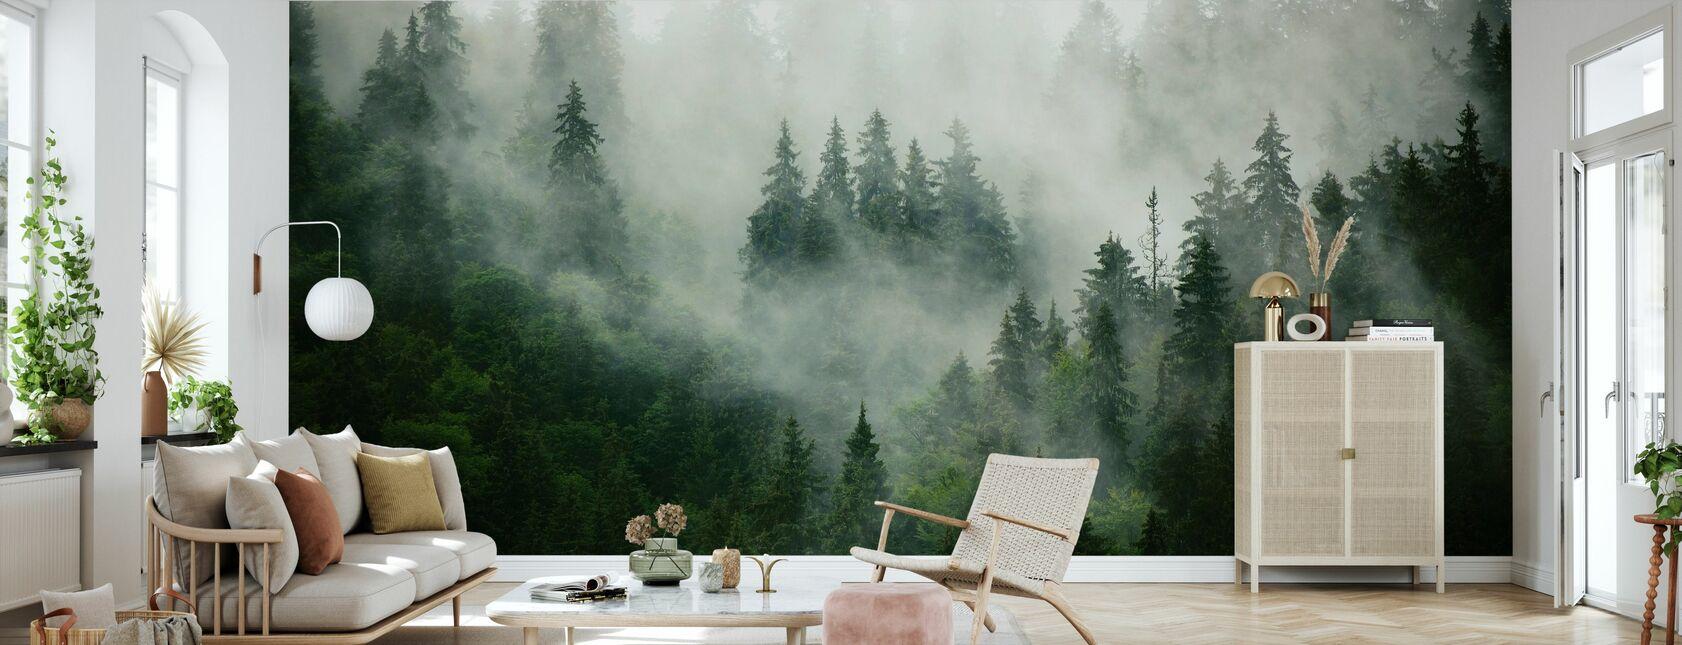 Tåkete skog - Tapet - Stue